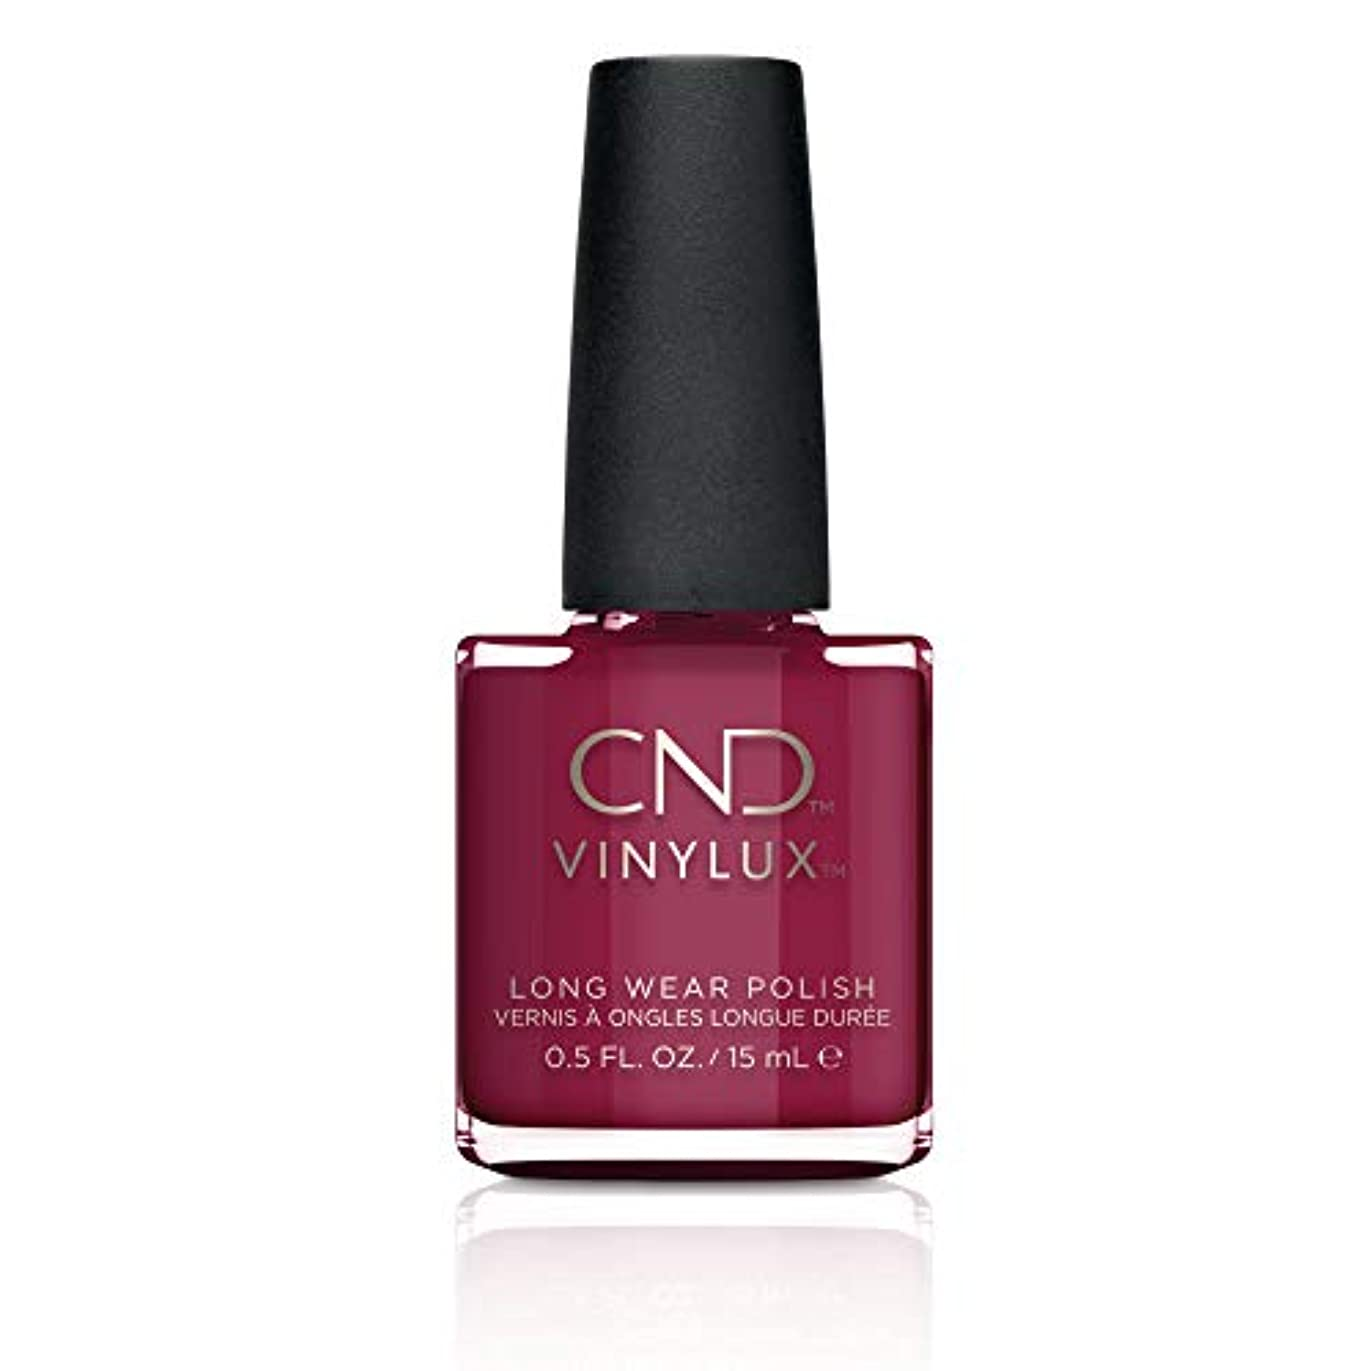 毒性重力請負業者CND Vinylux Nail Polish - Rouge Rite - 0.5oz / 15ml